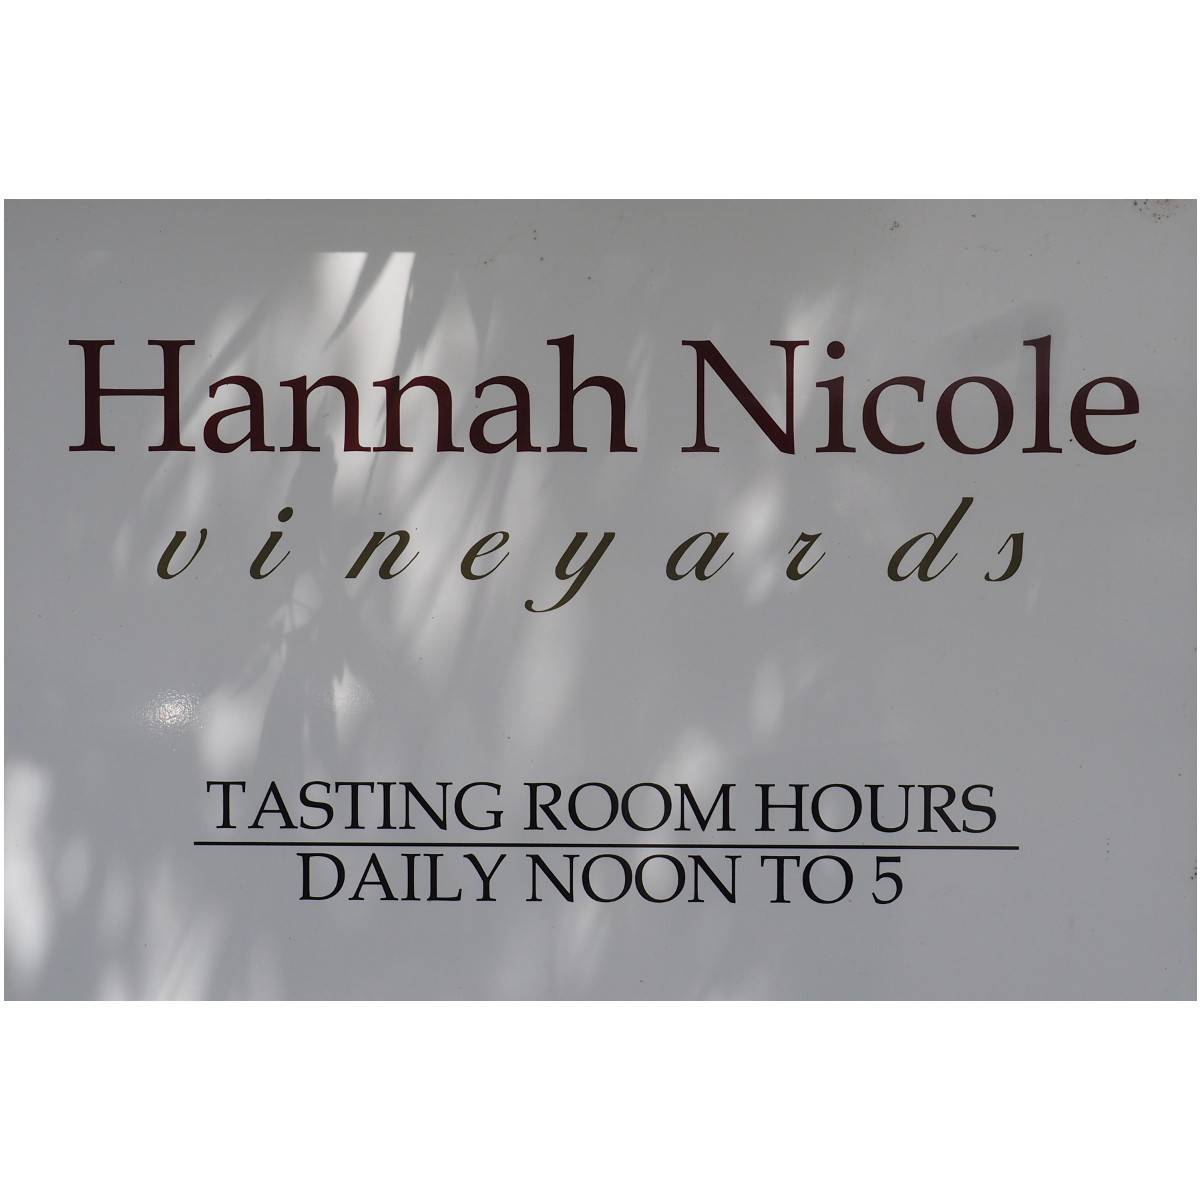 Hannah Nicole Winery Run